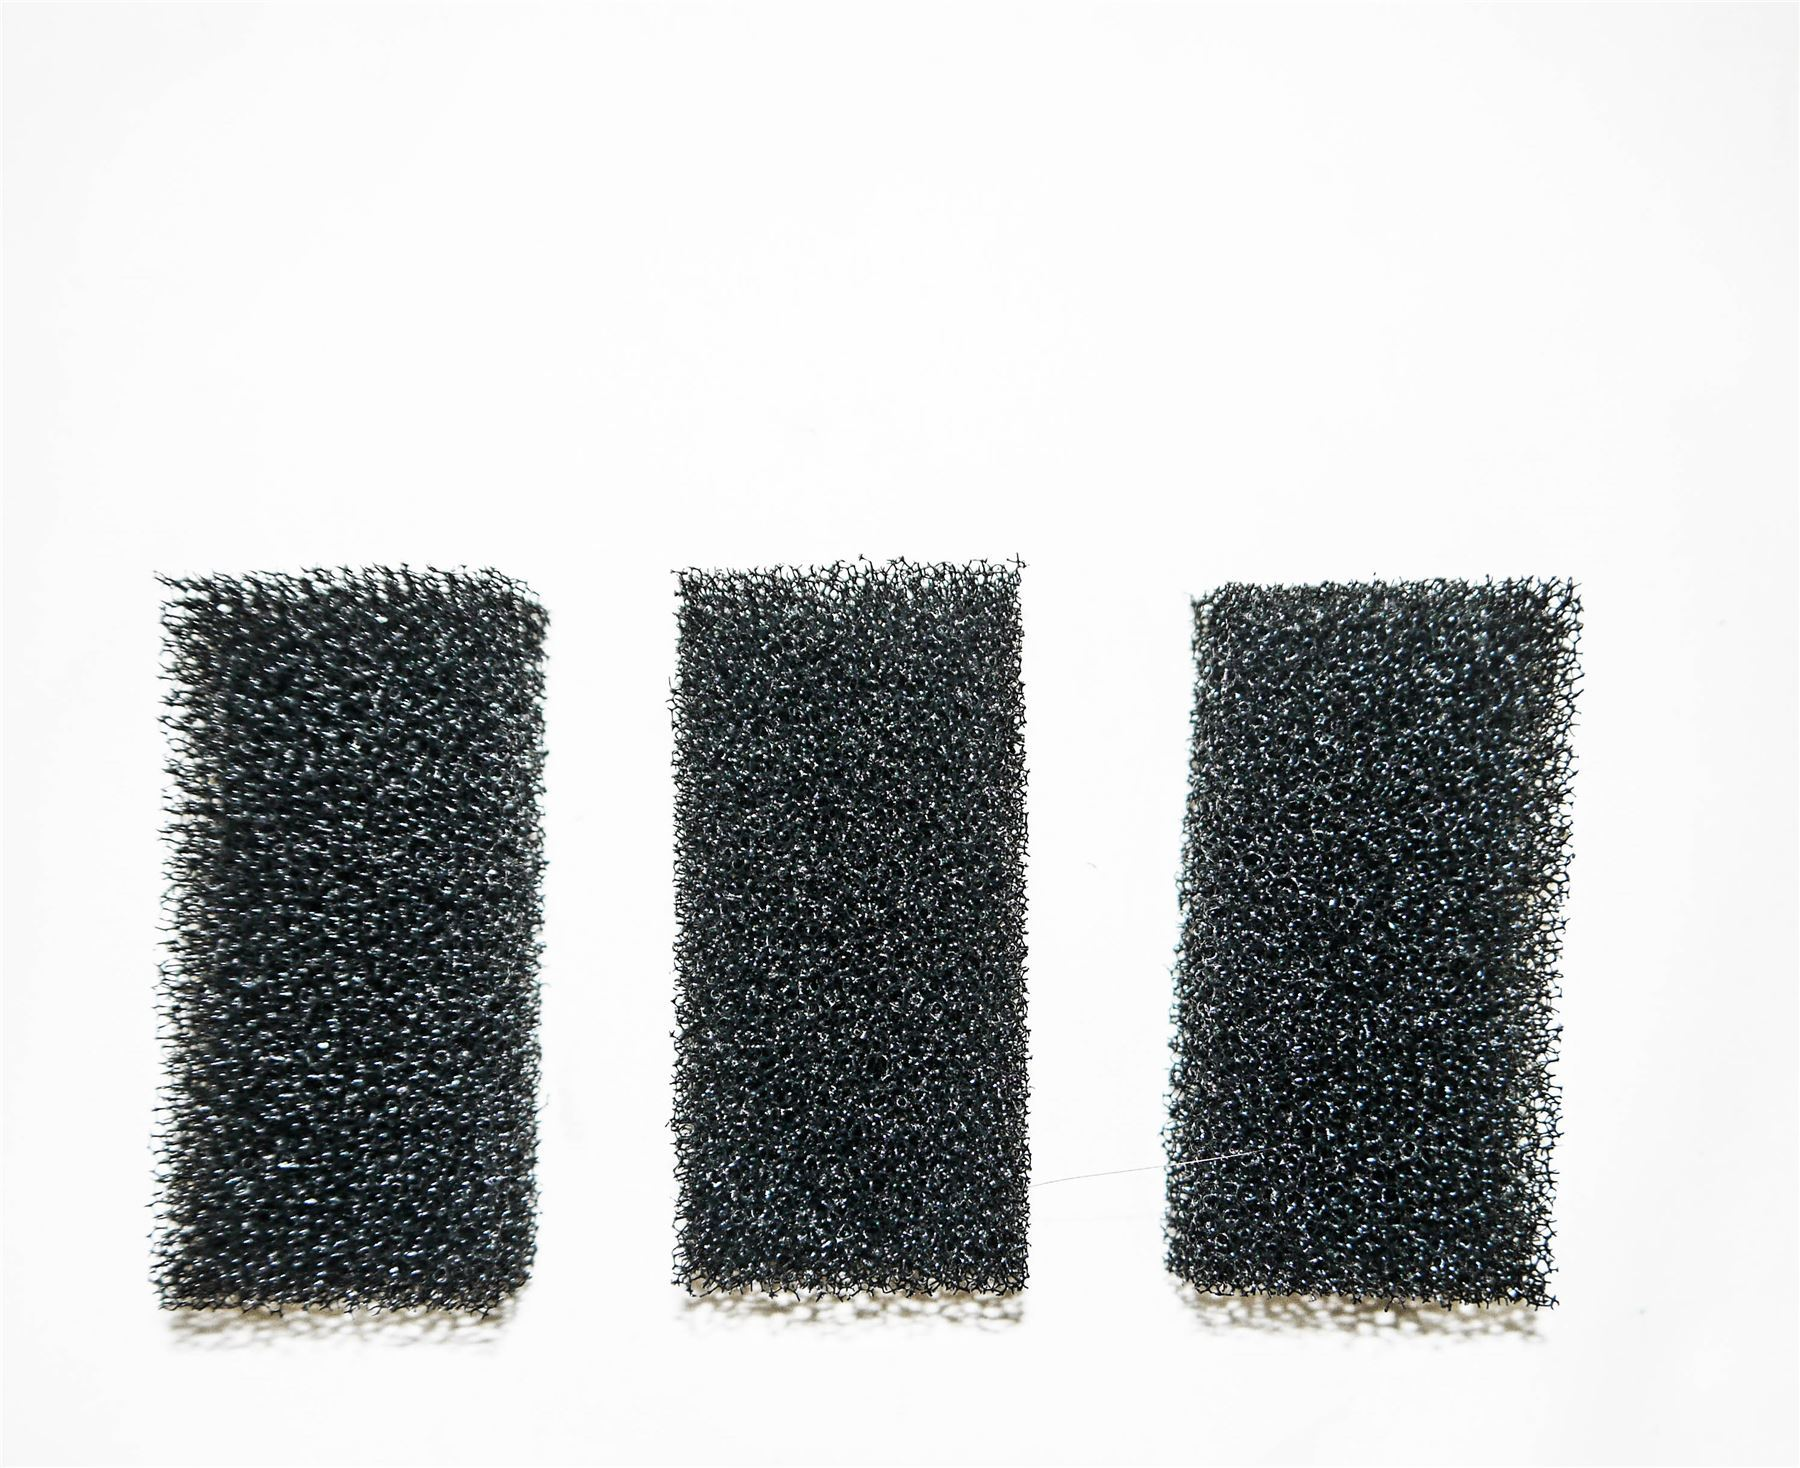 Fish tank filter sponge - Aquarium Hidom Replacement Internal Filter Foam Sponge Pad